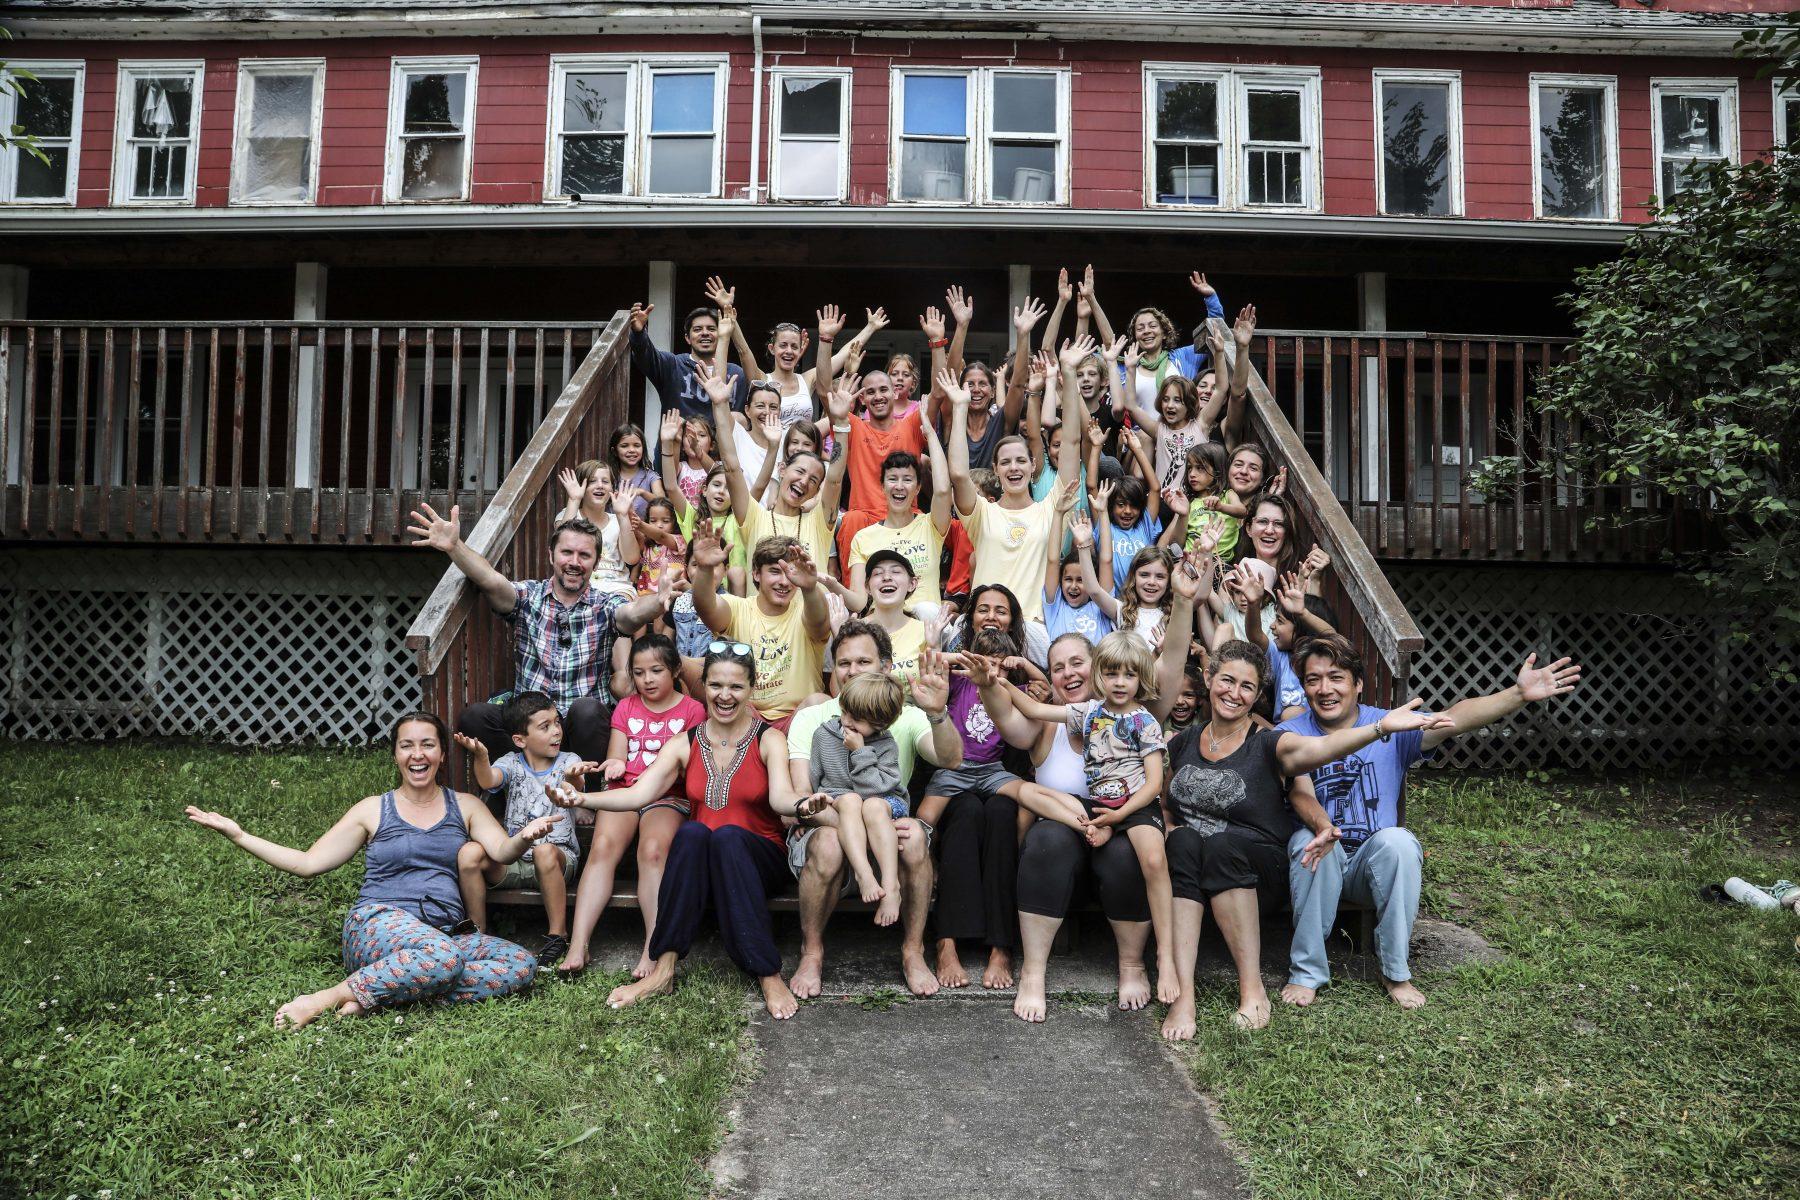 Family Yoga Week at the Sivananda Yoga Ranch